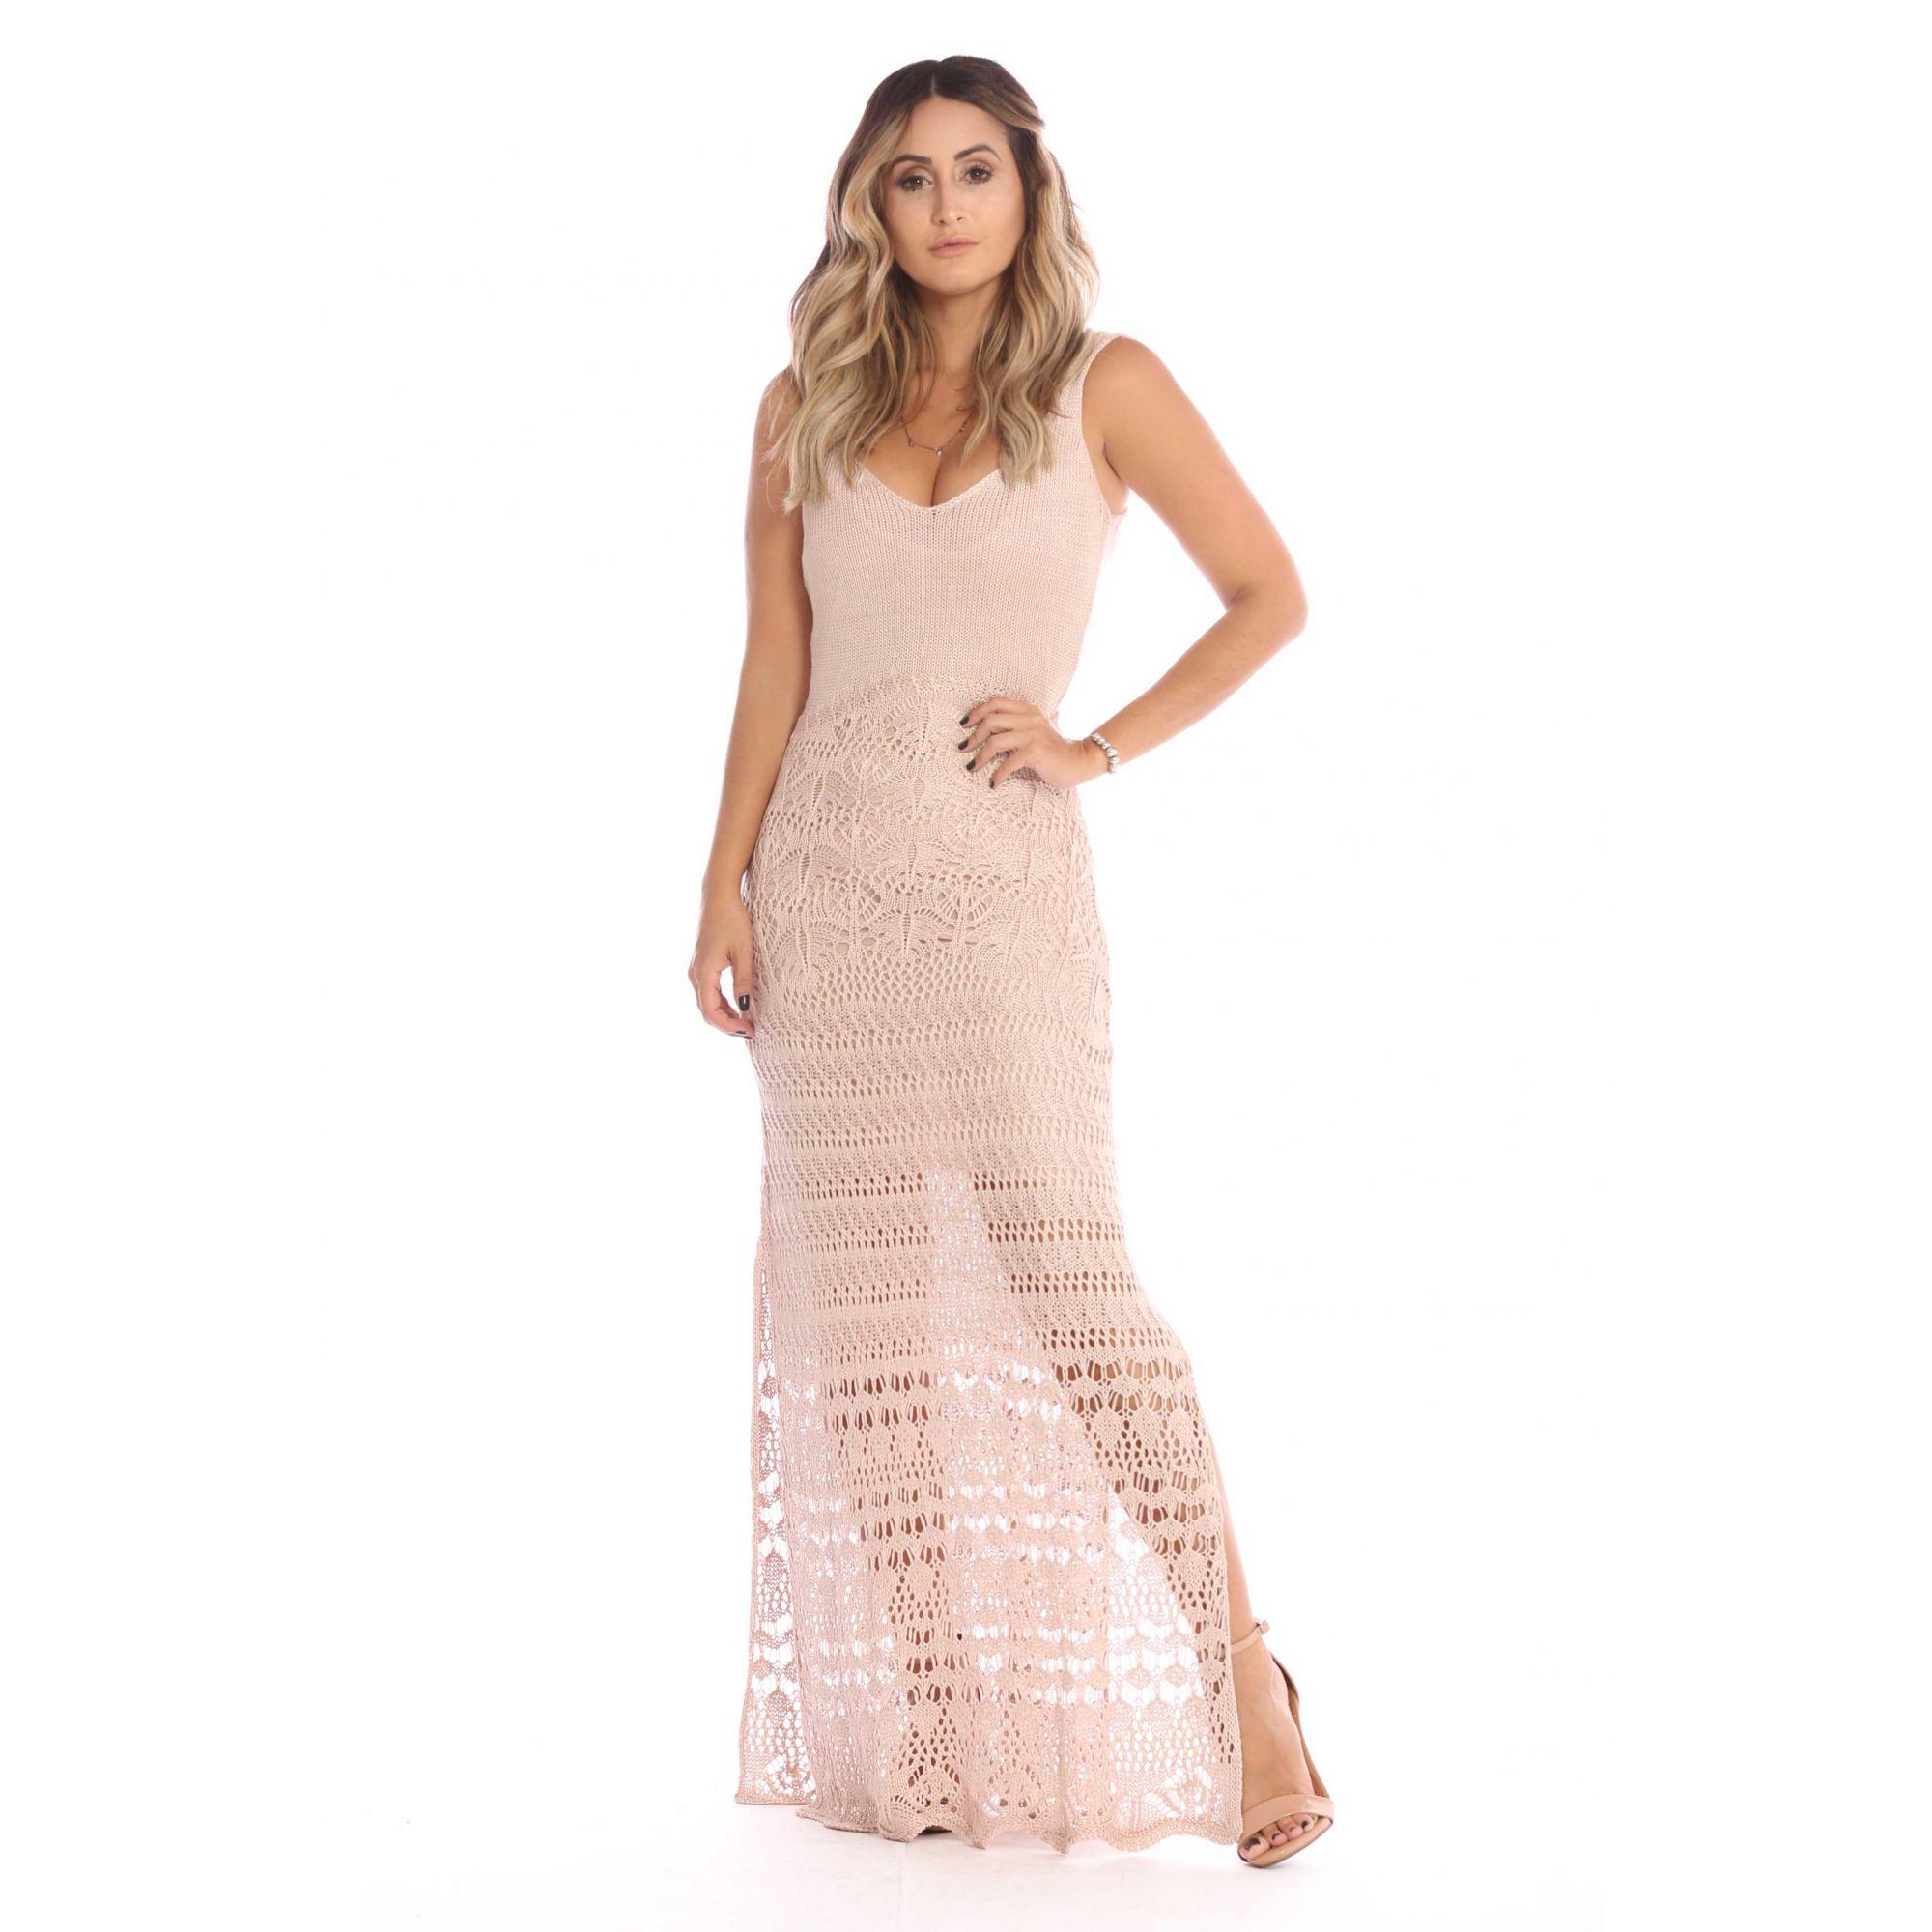 Tricô Vestido Longo Vera Tricot Decote V Rendado Feminino